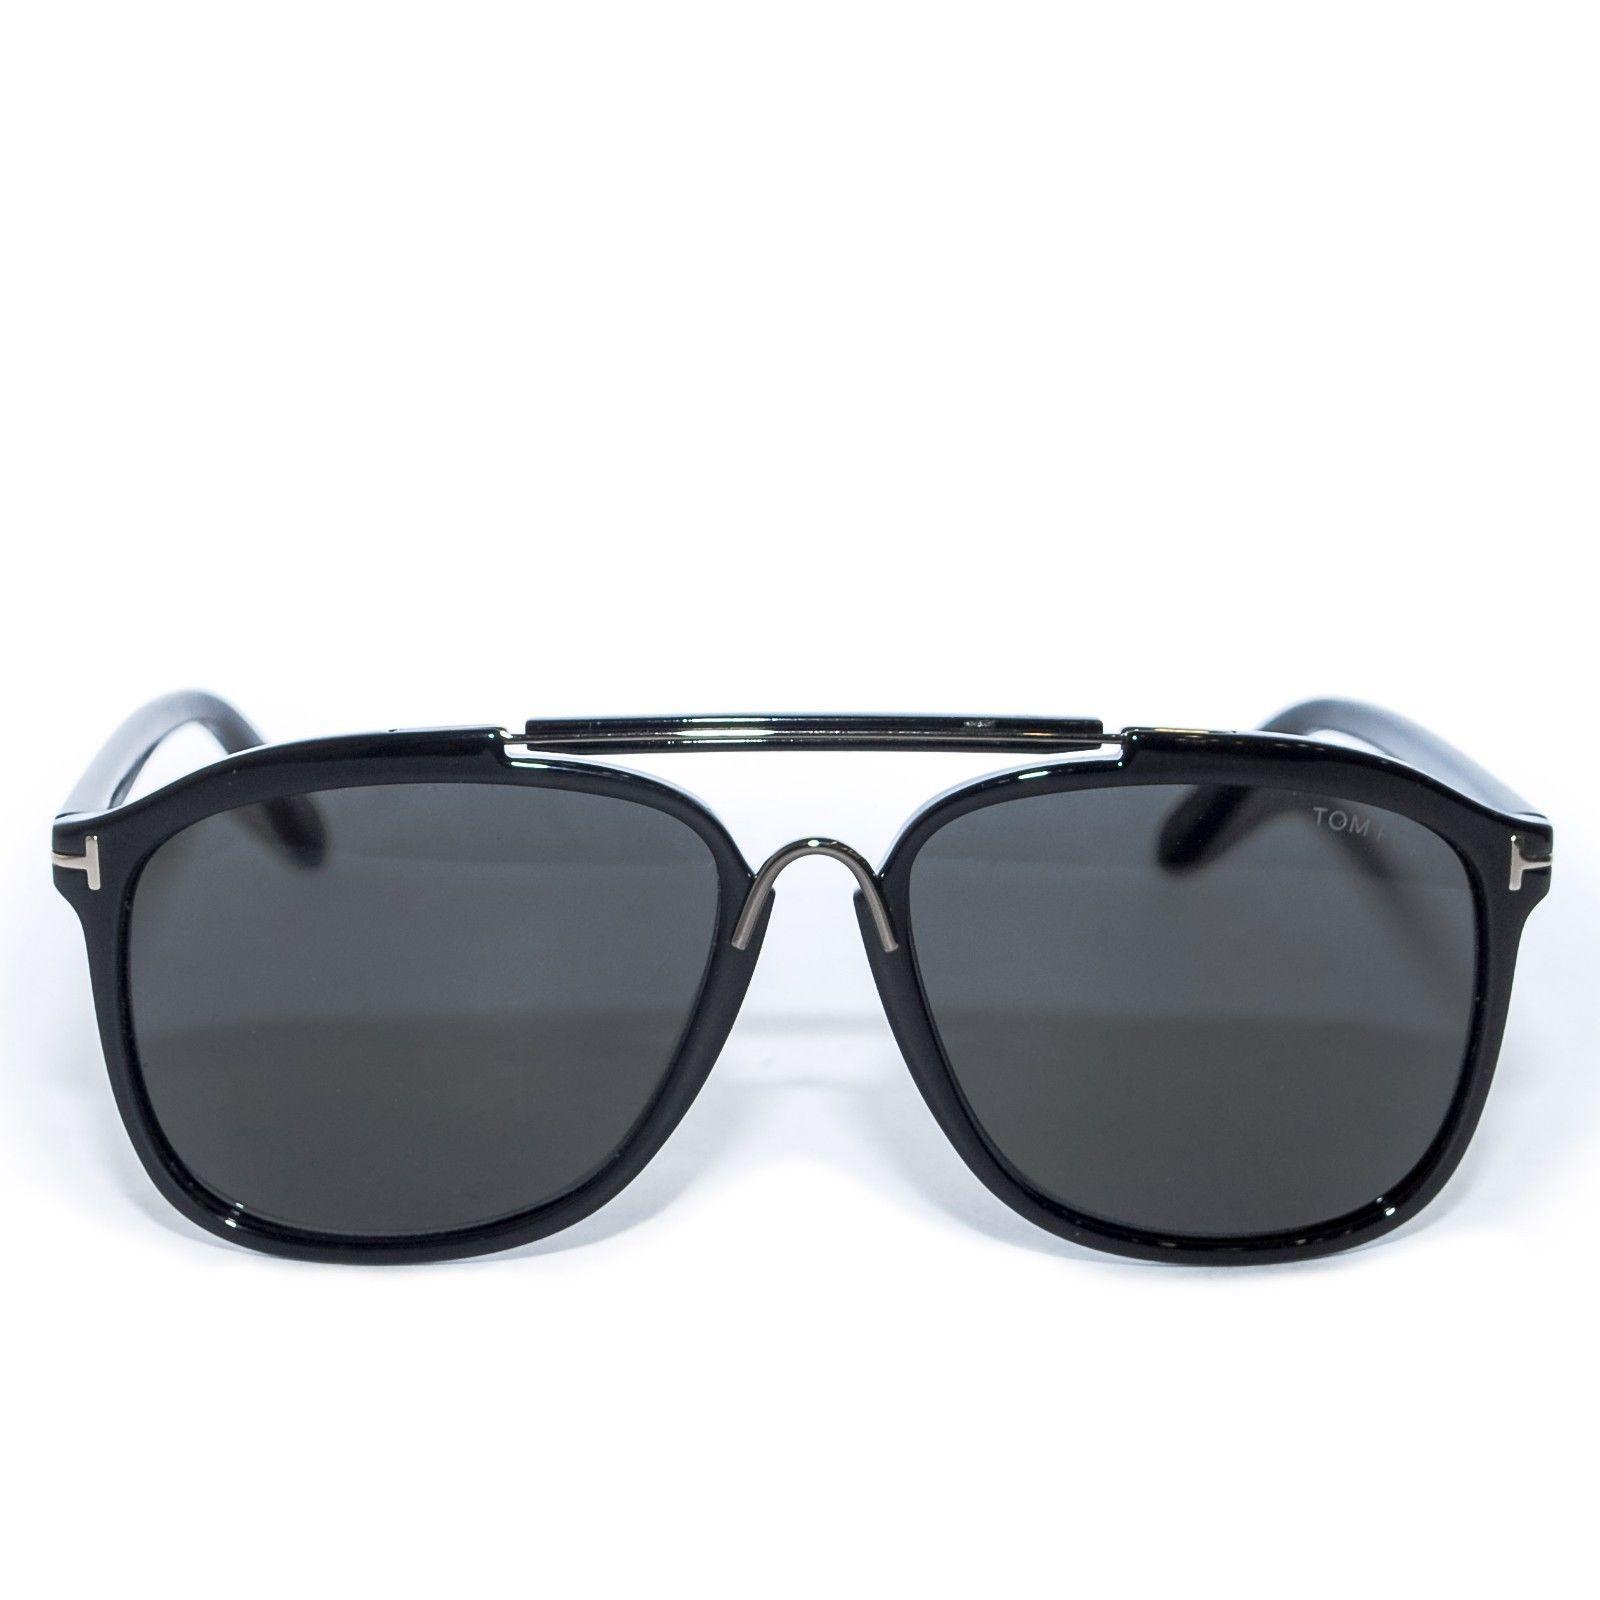 eecac6e2f3 TOM FORD Black Square Sunglasses Plastic Frame Ladies Fashion Eyewear with  Case -  275.51